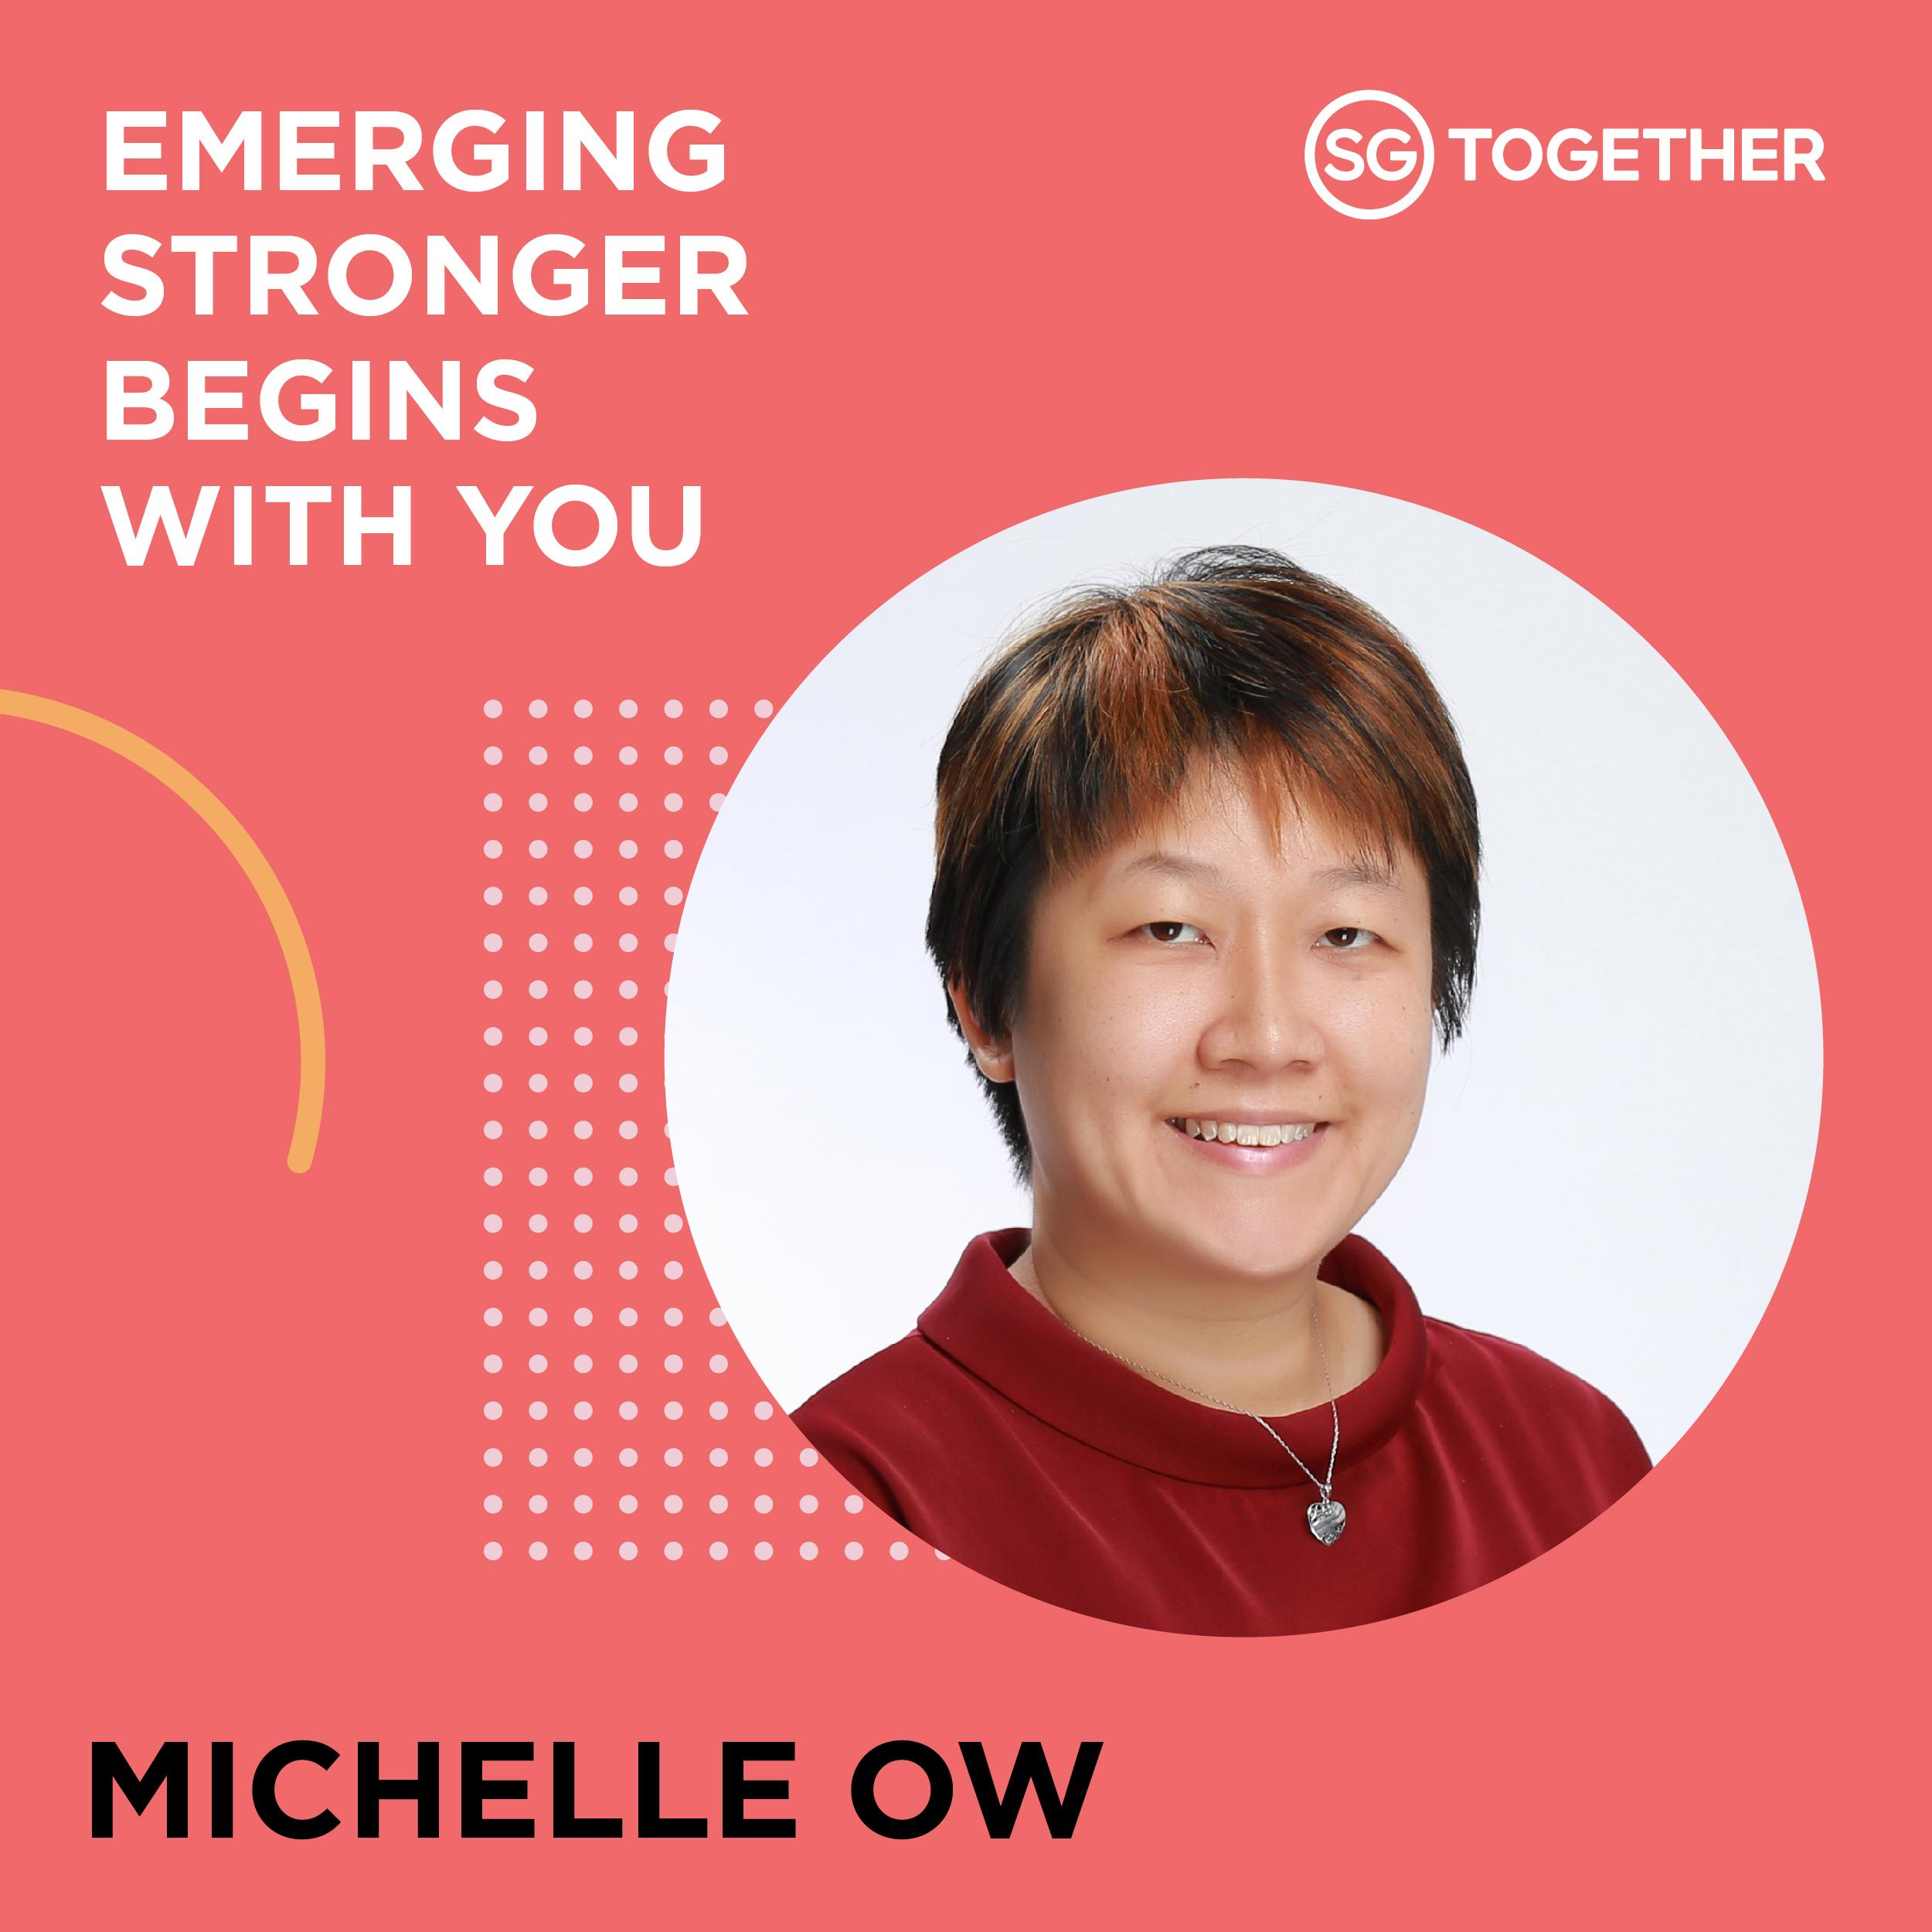 Michelle Ow